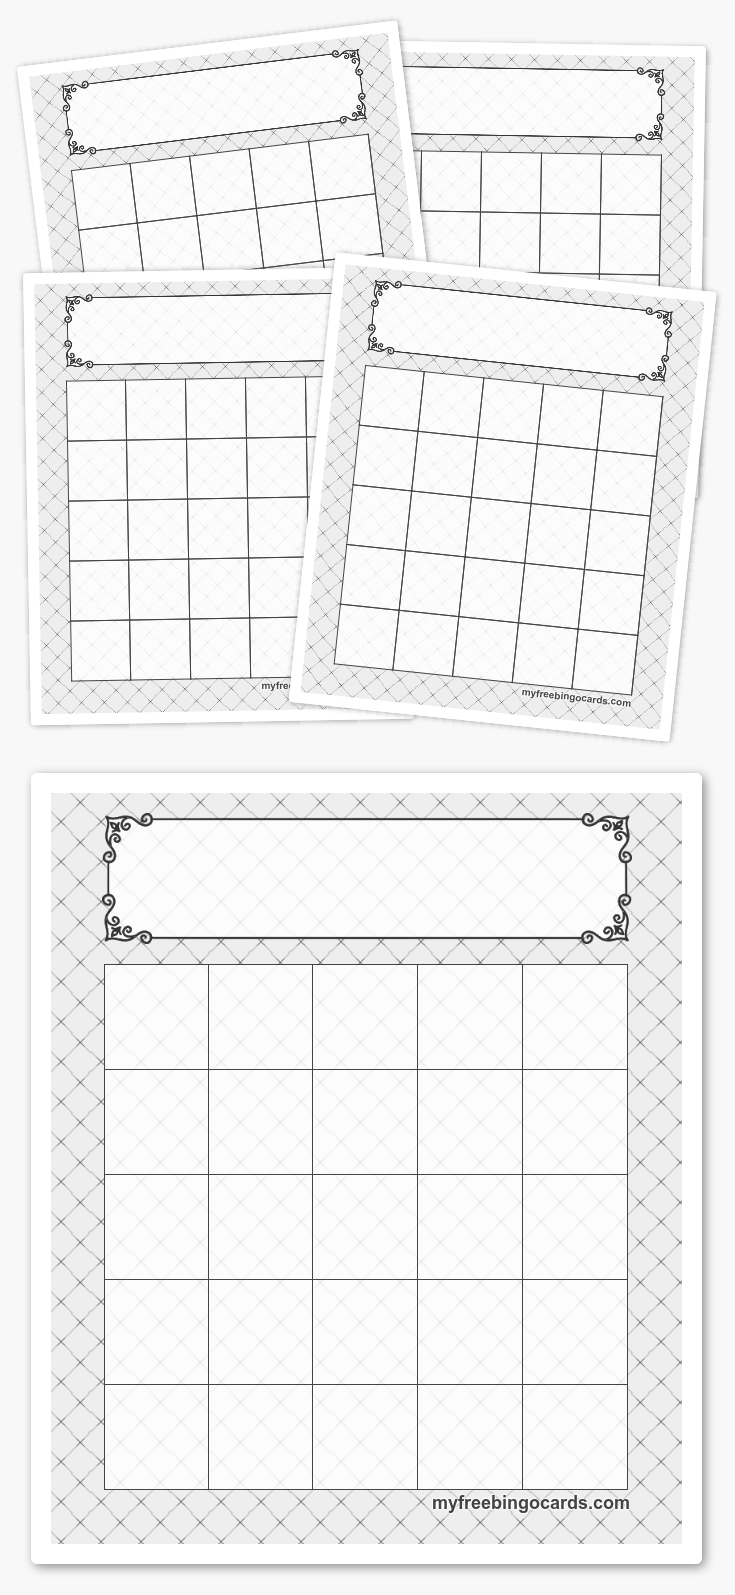 Free Printable 5X5 Bingo Templates | Feladatlapok